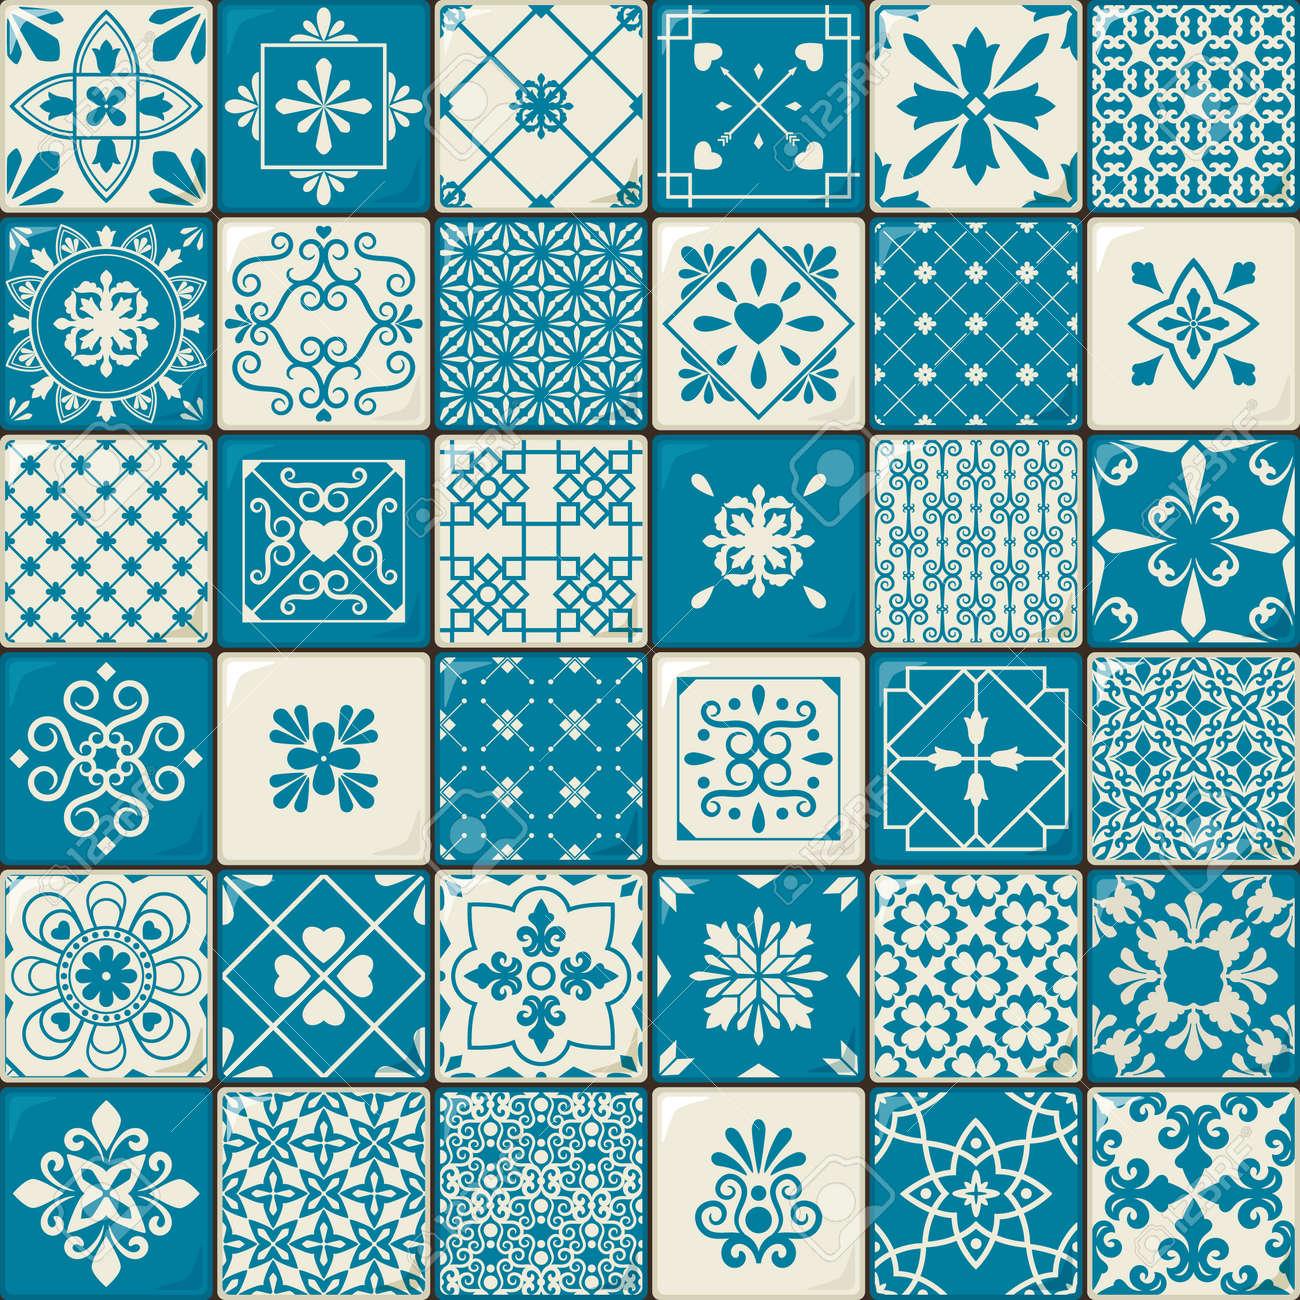 Ceramic tile set. Vintage oriental moroccan style tiles patterns or spanish flowers decorative motifs. Vector illustration - 166882760